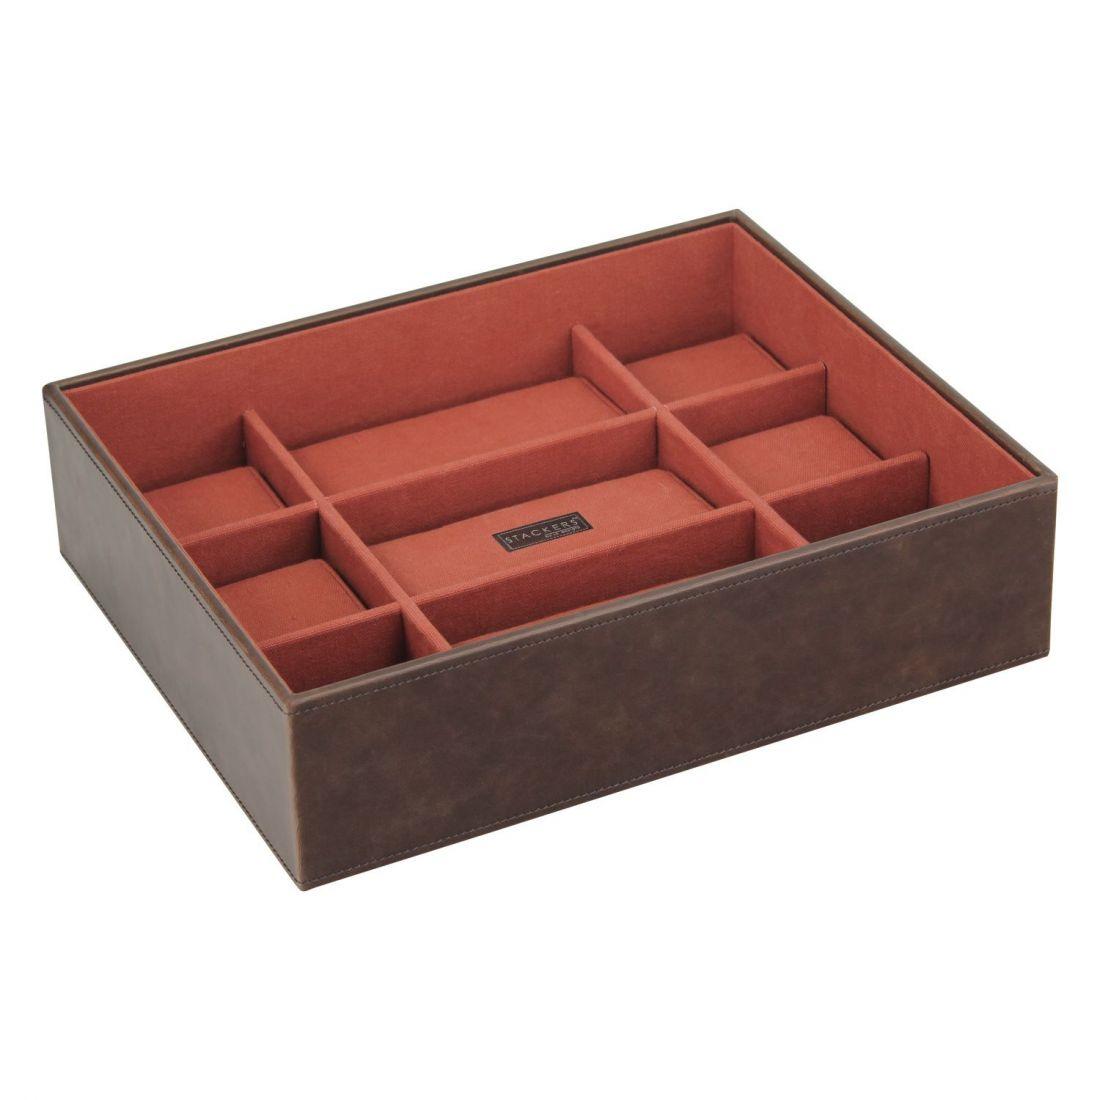 boite 15 montres stackers empilable module2 marron orange. Black Bedroom Furniture Sets. Home Design Ideas